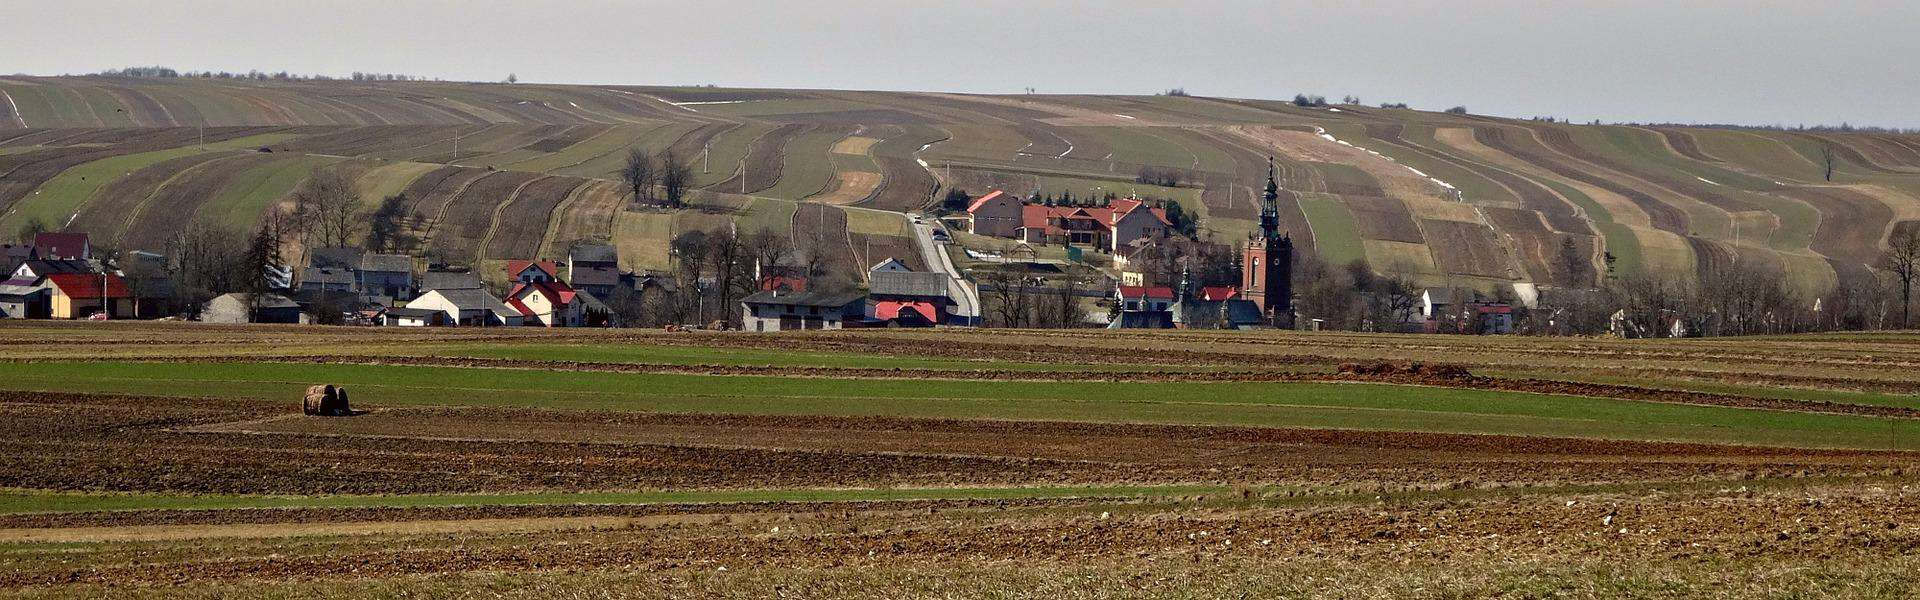 fields 1330974 1920 - AgroEcosun